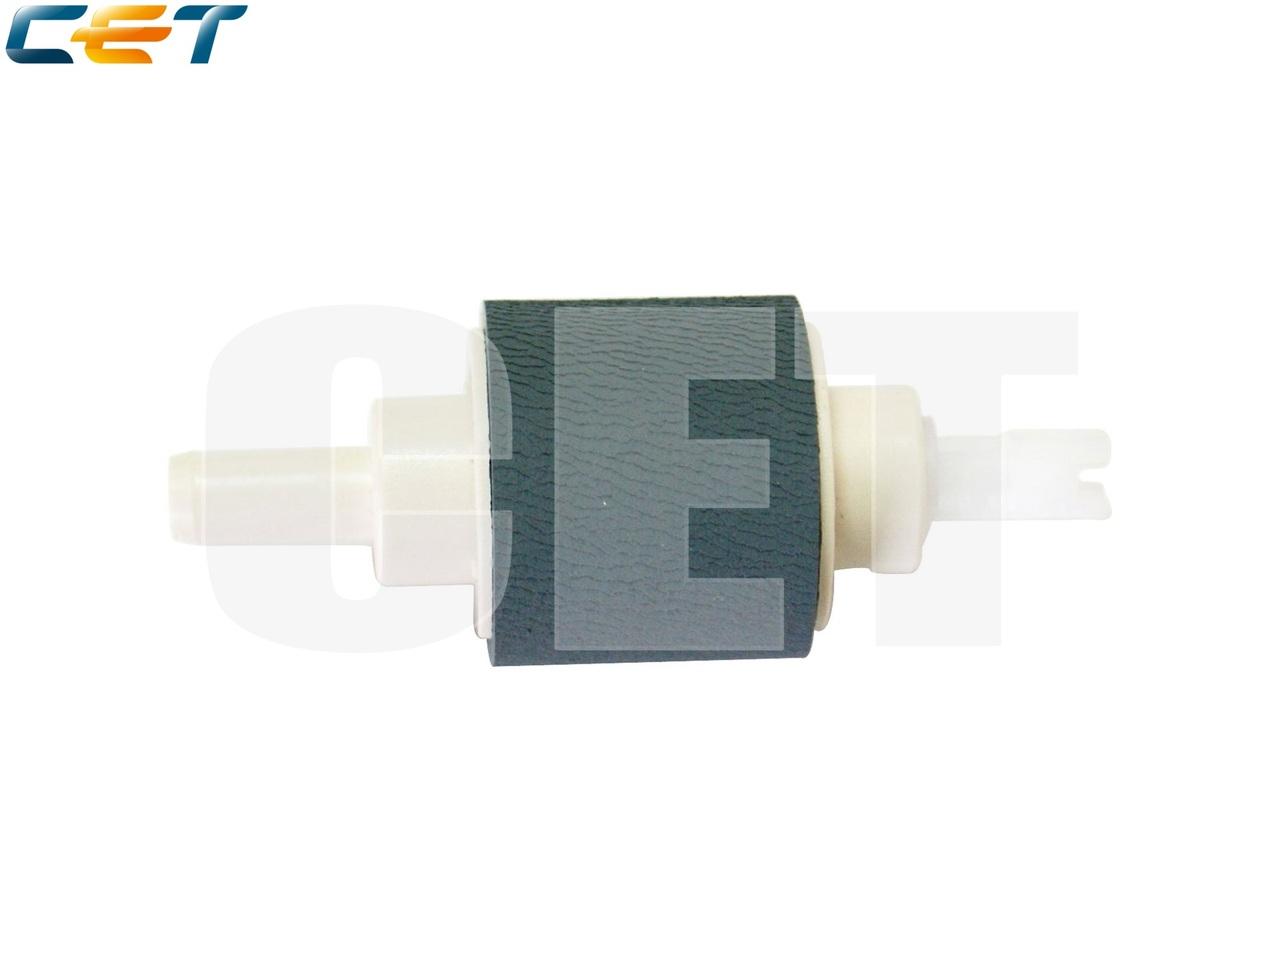 Ролик подхвата 2-го лотка RM1-6414-000, RM1-9168-000 дляHP LaserJet P2035/P2055, M401/M425 (CET), CET3690,CET3690R